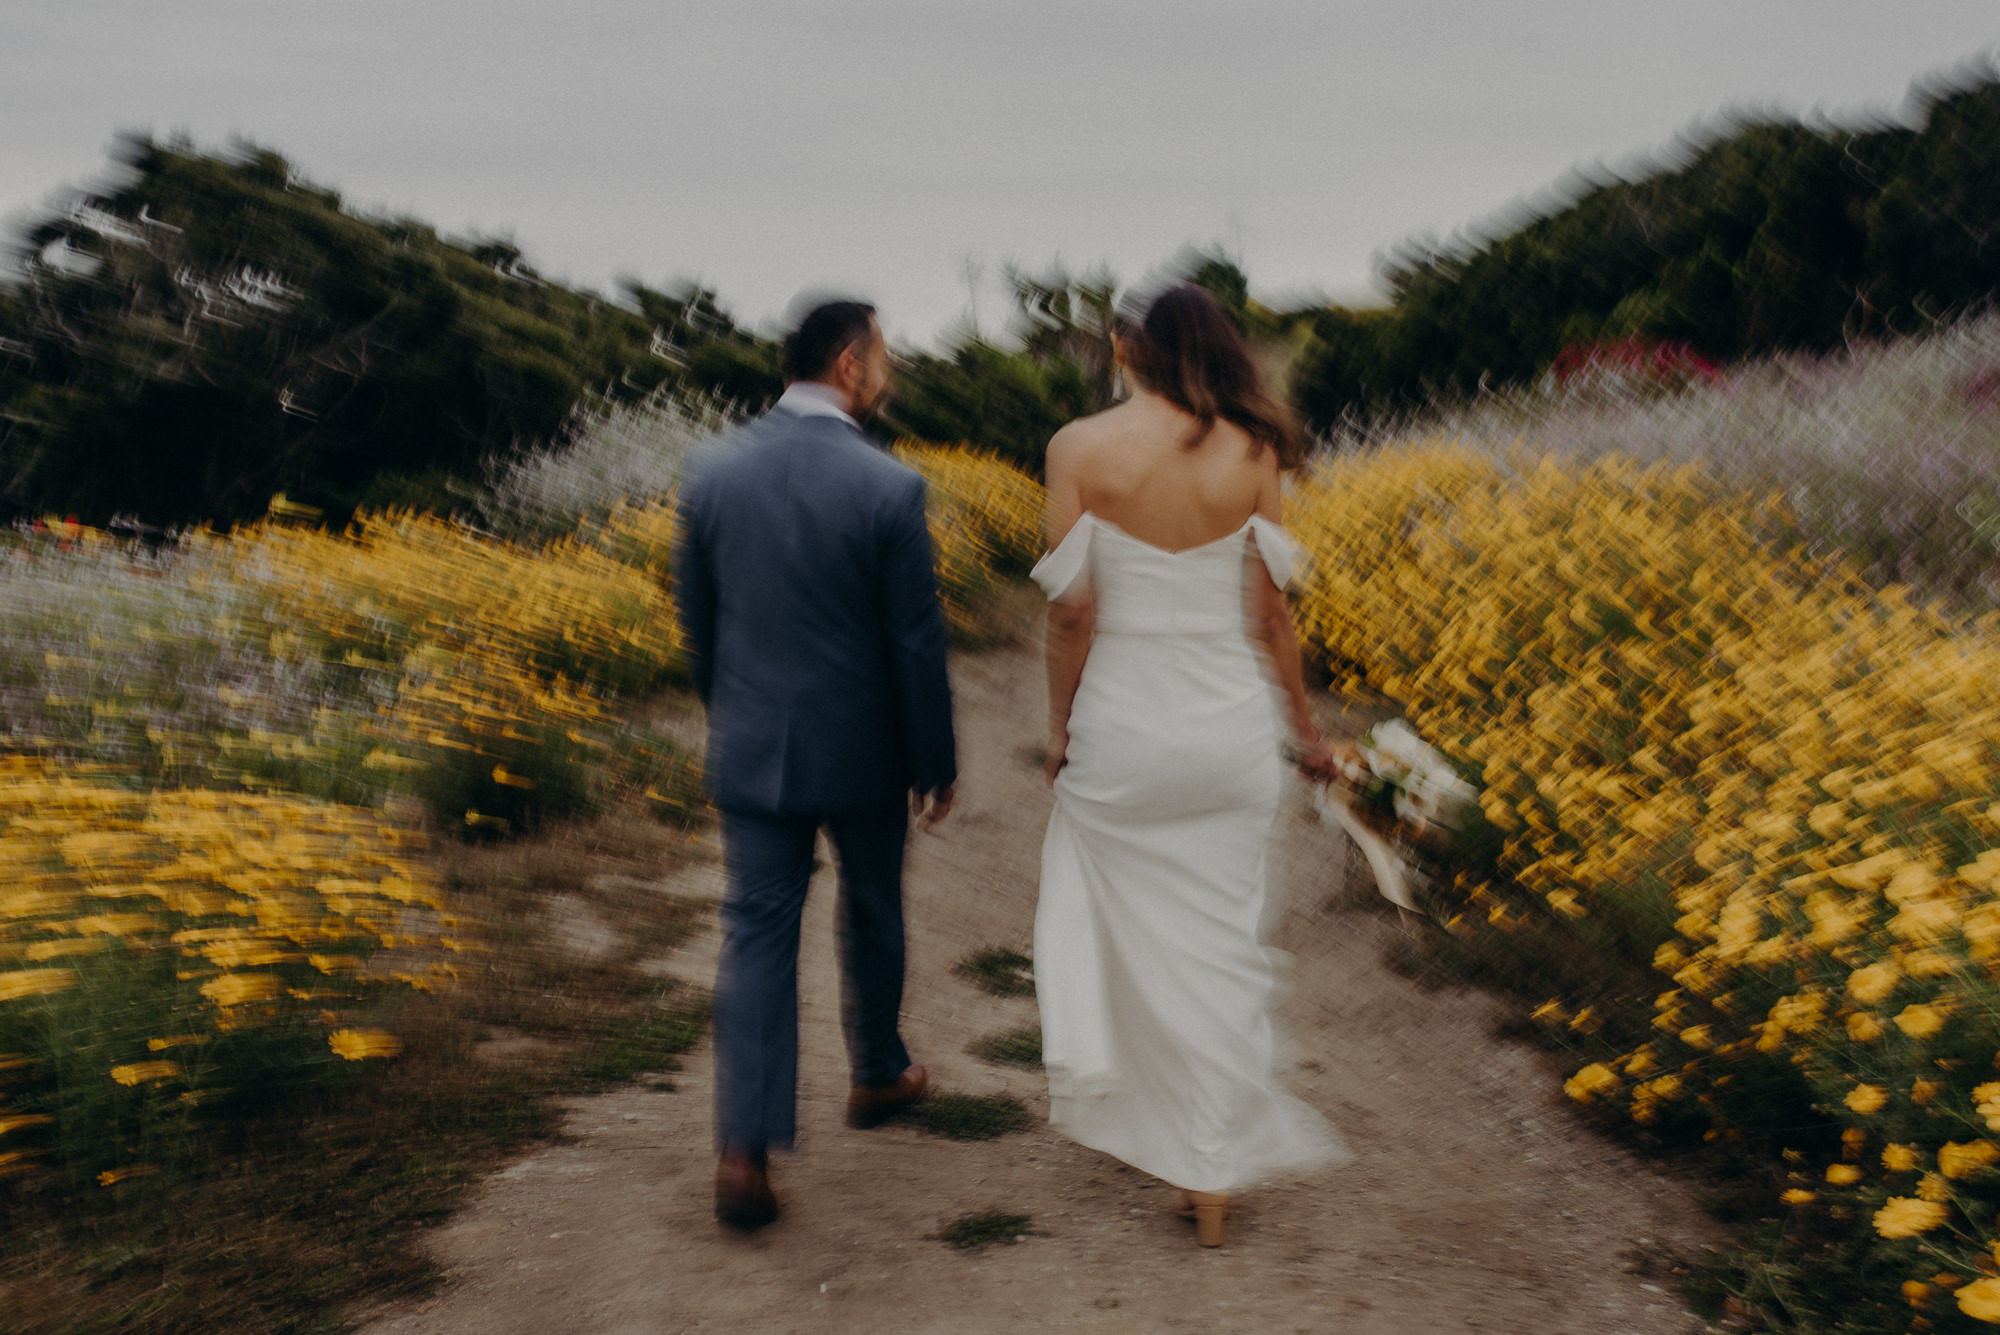 elopement photographer in los angeles - la wedding photographer - isaiahandtaylor.com-033.jpg